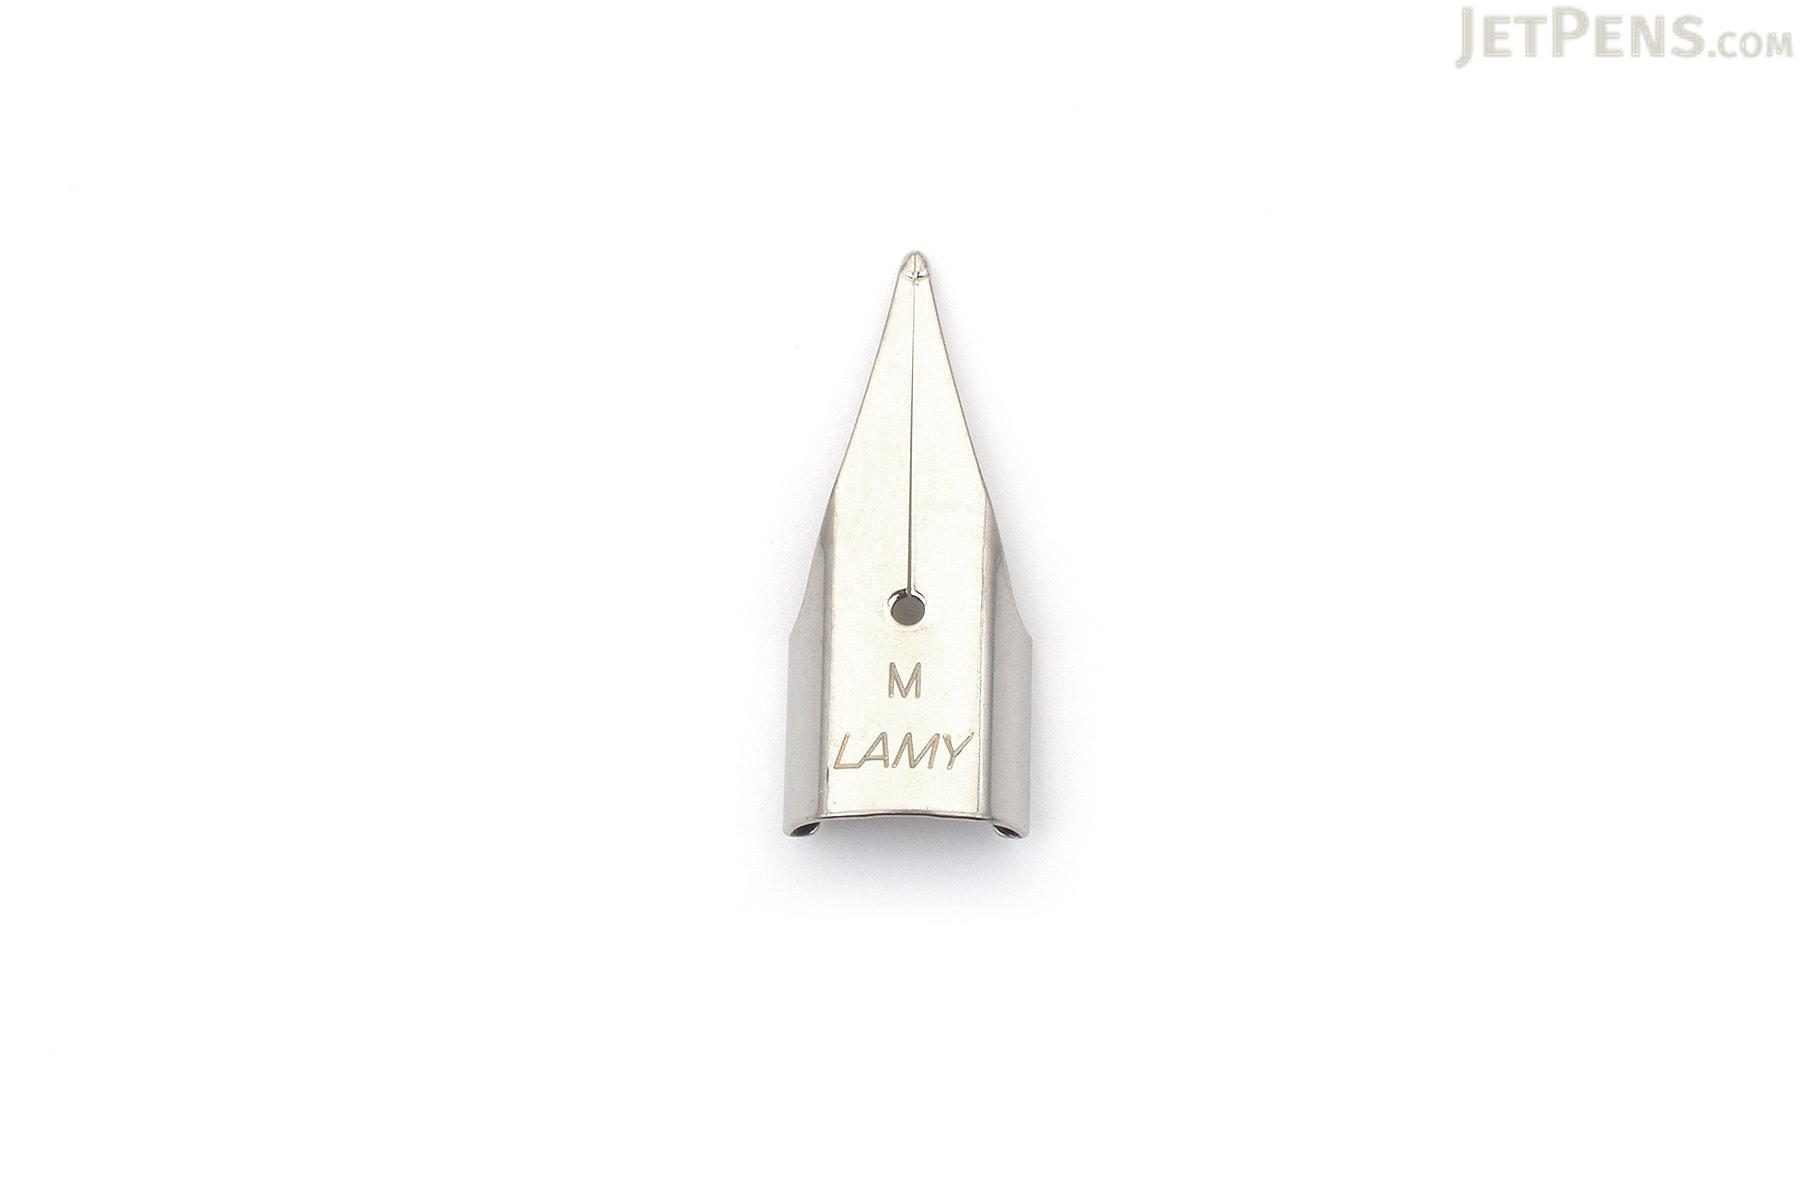 Lamy Fountain Pen Nib - Stainless Steel Finish - Medium - LAMY LZ50SL-M